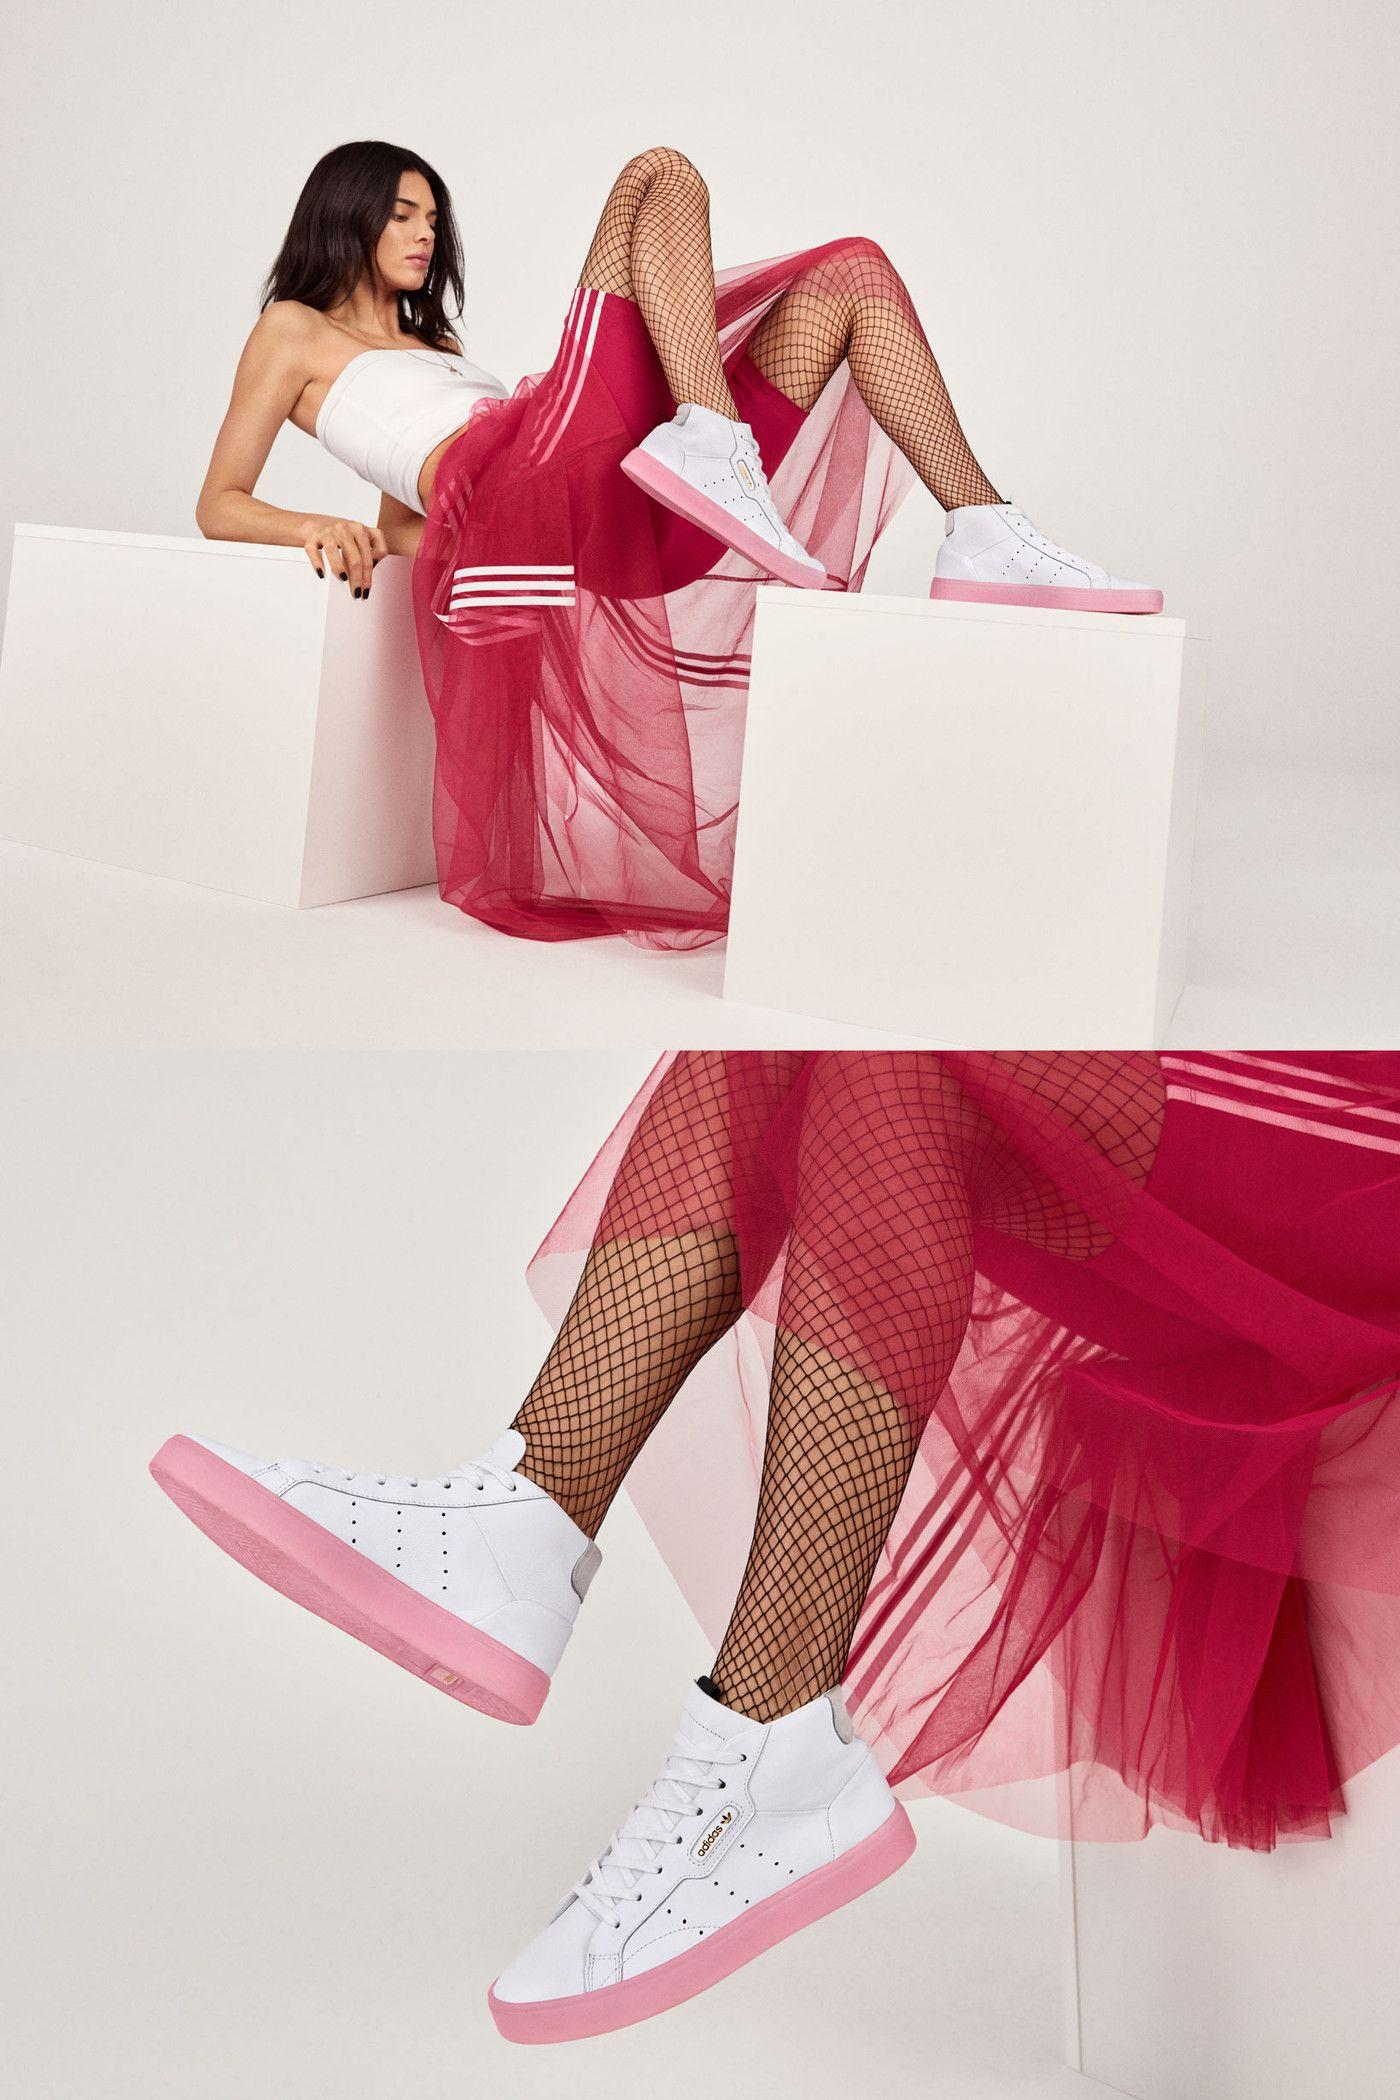 Kendall Jenner Stars in adidas' New Sleek Lookbook